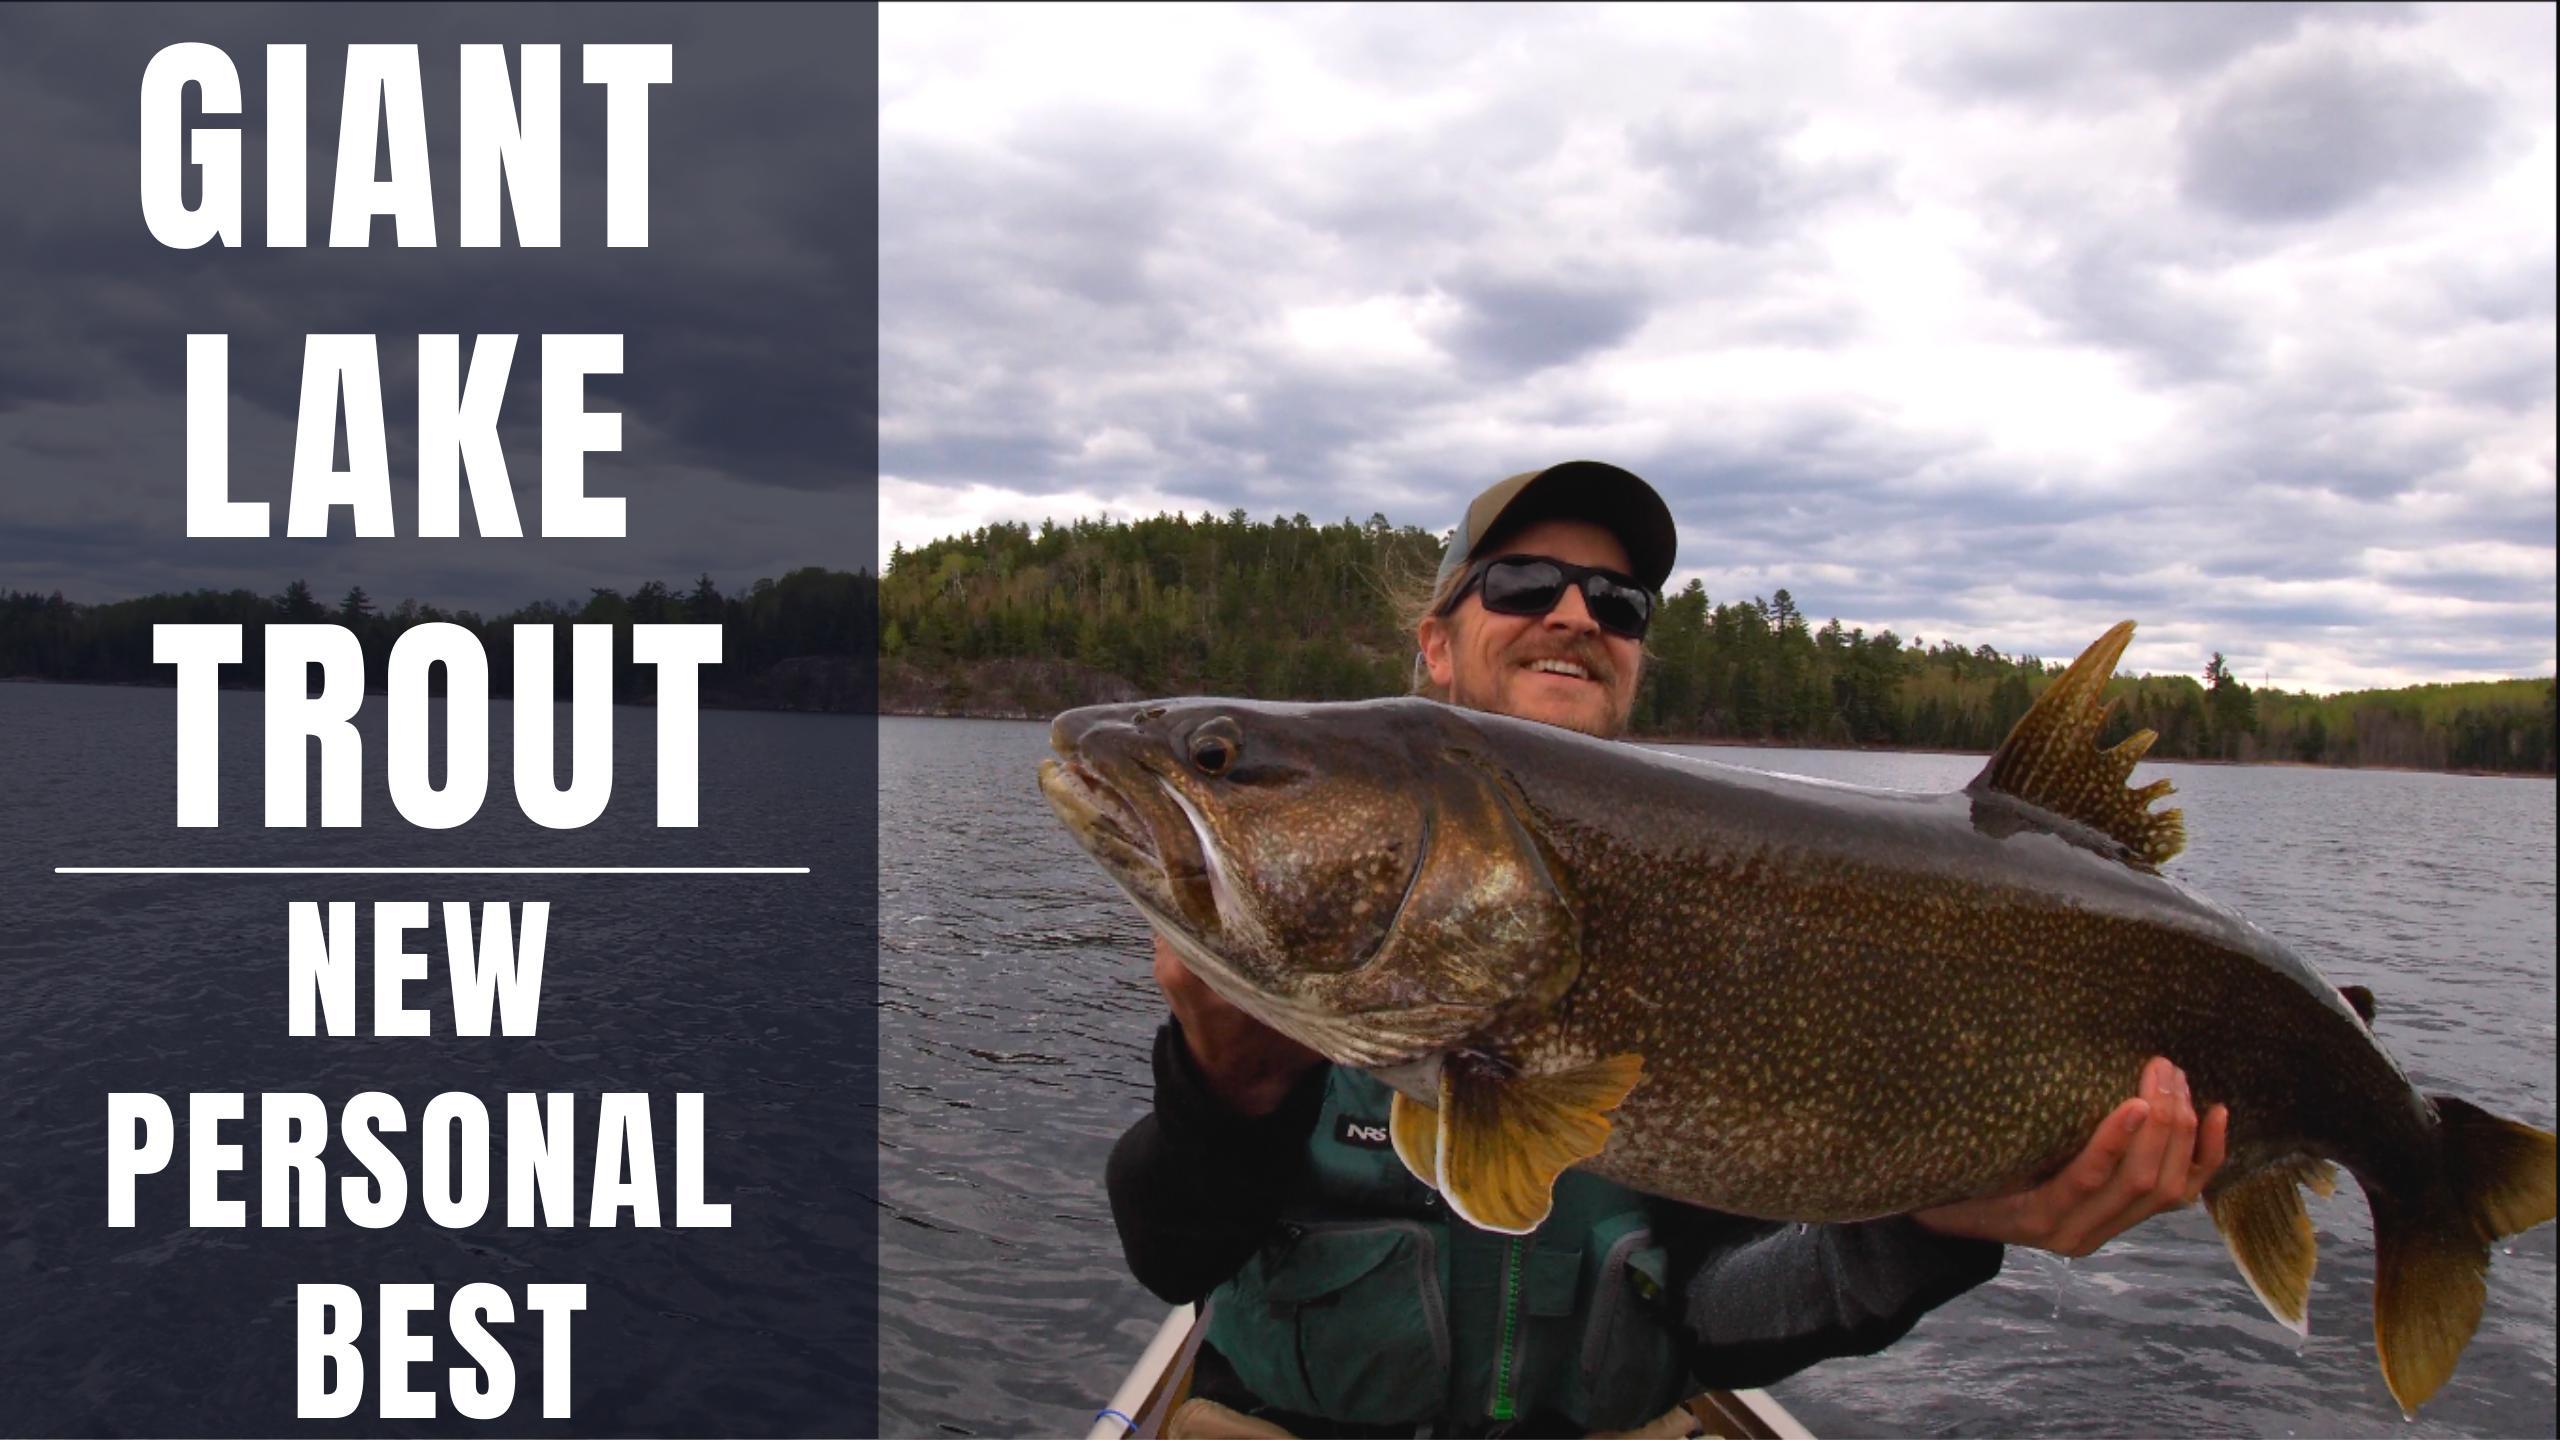 Giant Lake Trout Lac La Croix Boundary Waters Fishing